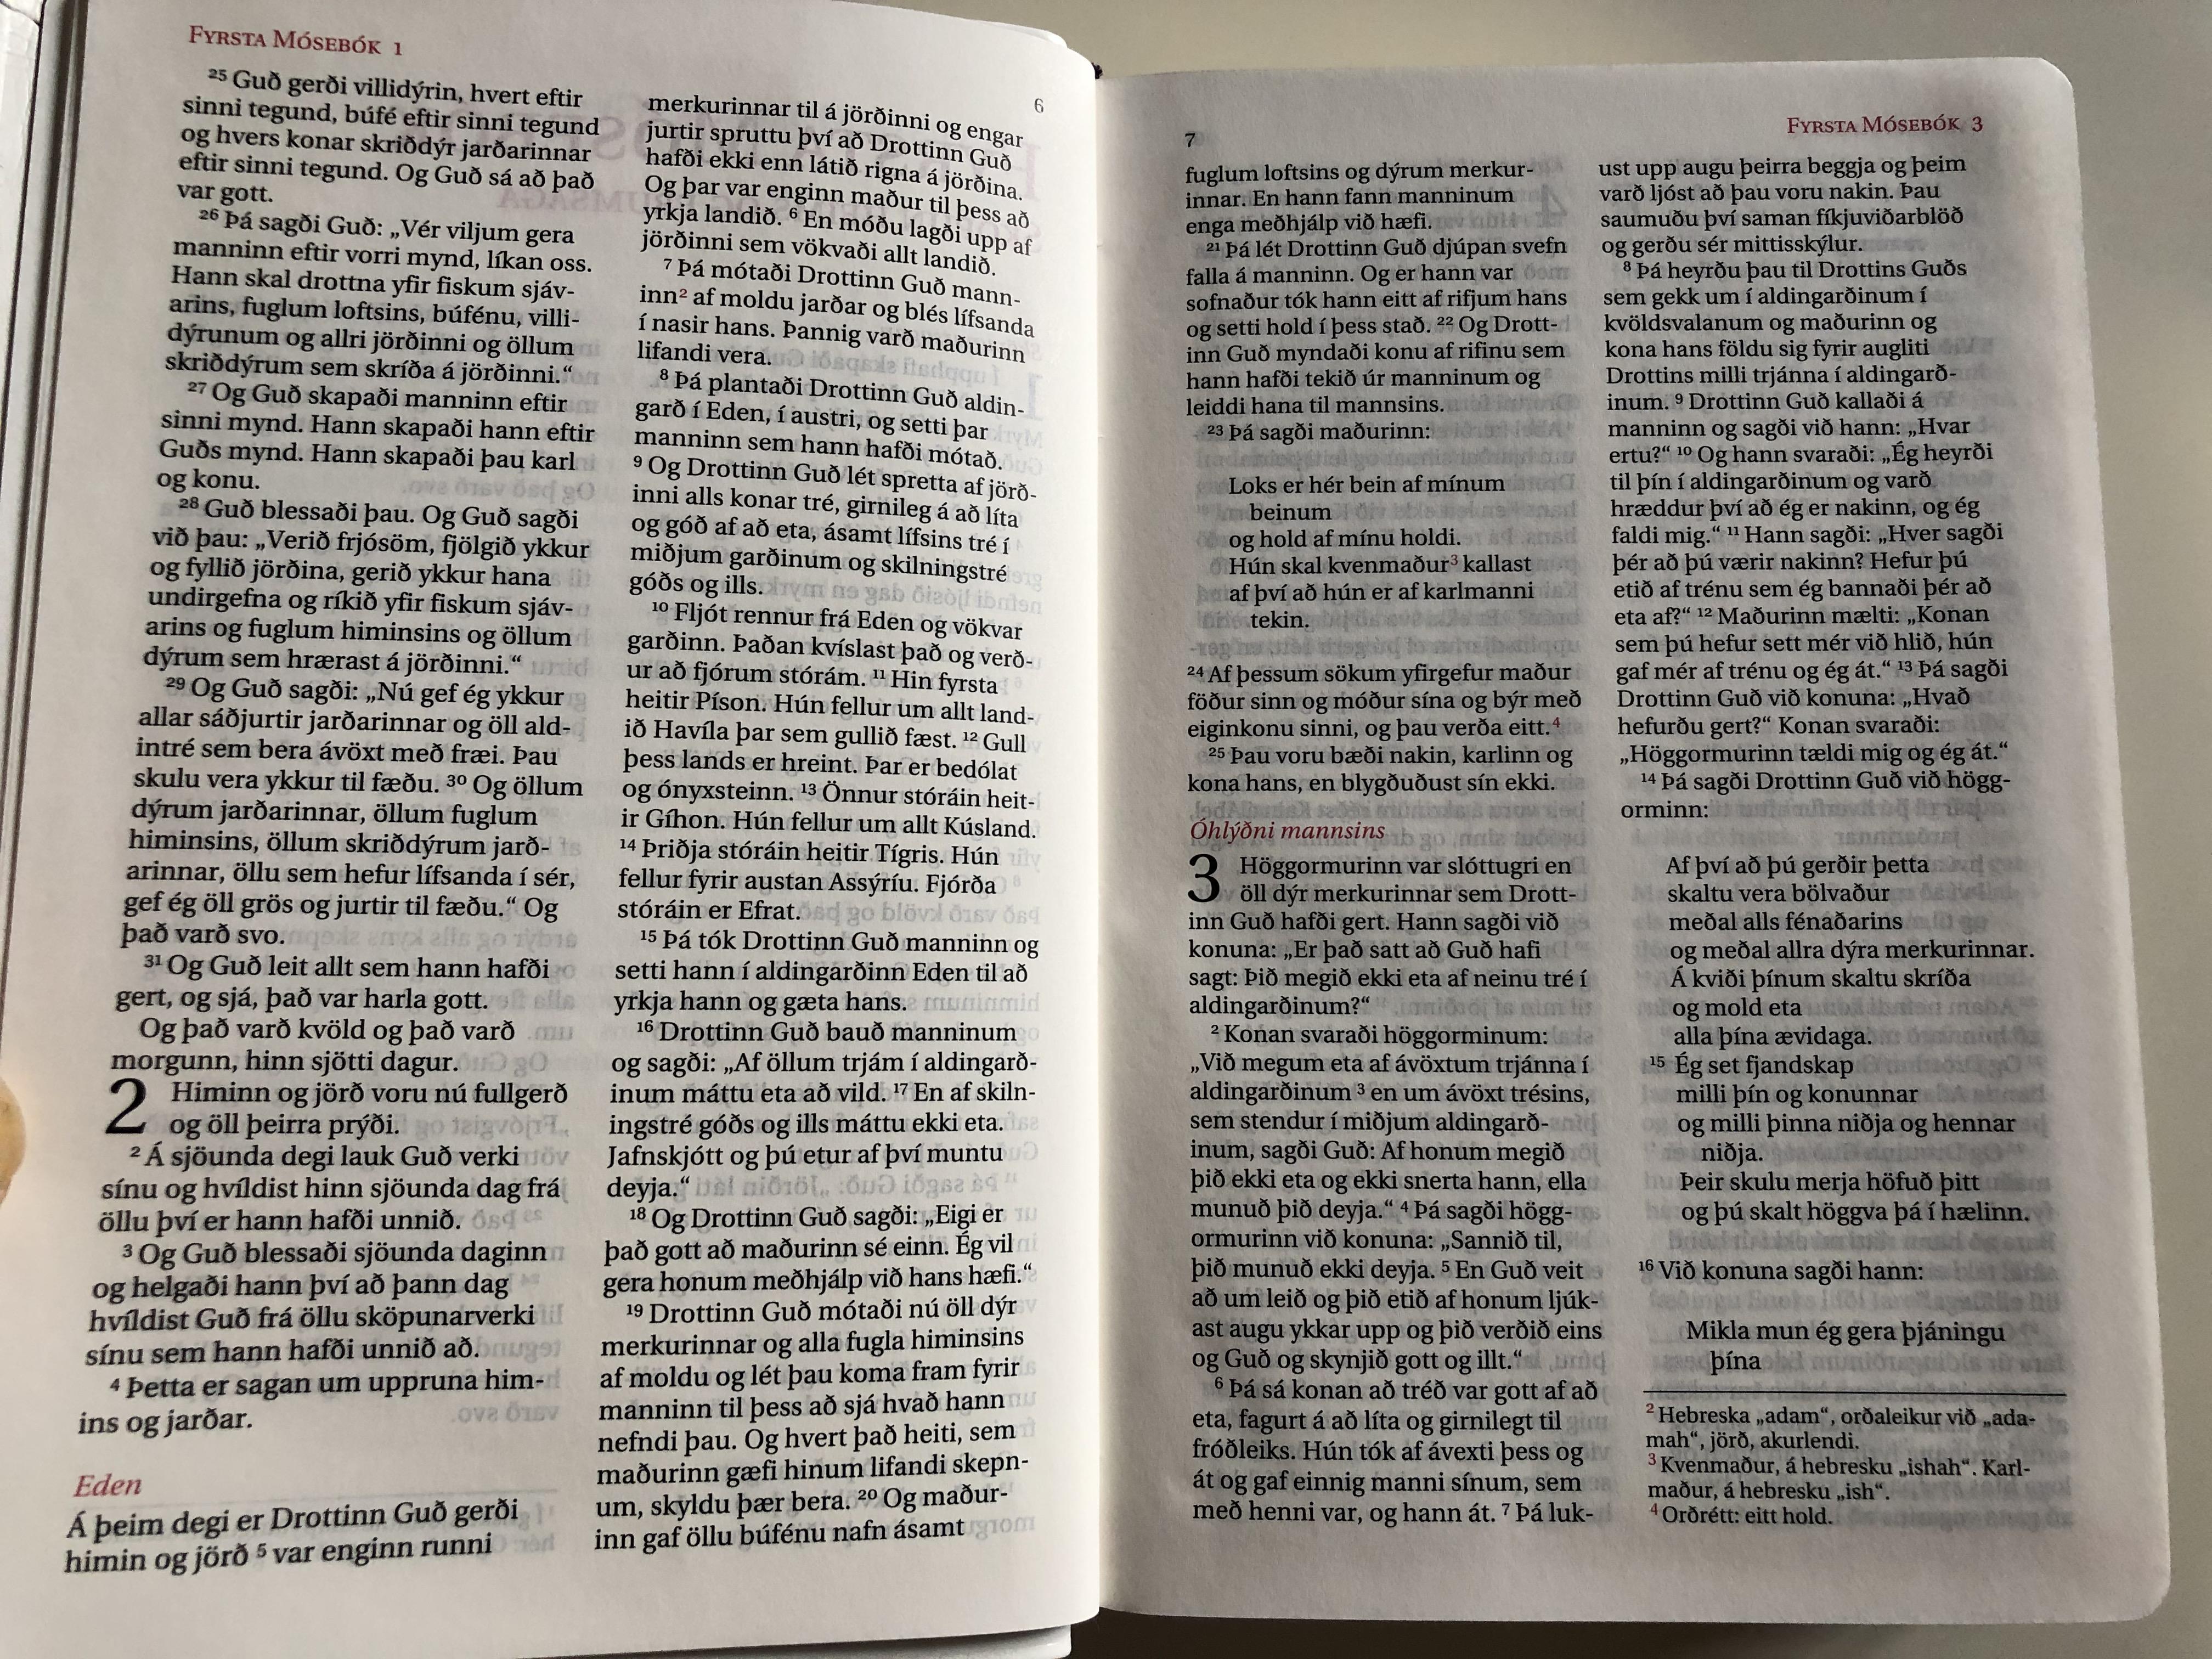 icelandic-catholic-bible-bibl-an-gamla-testamenti-samt-ap-kr-fu-b-kunum-n-ja-testamenti-13.jpg